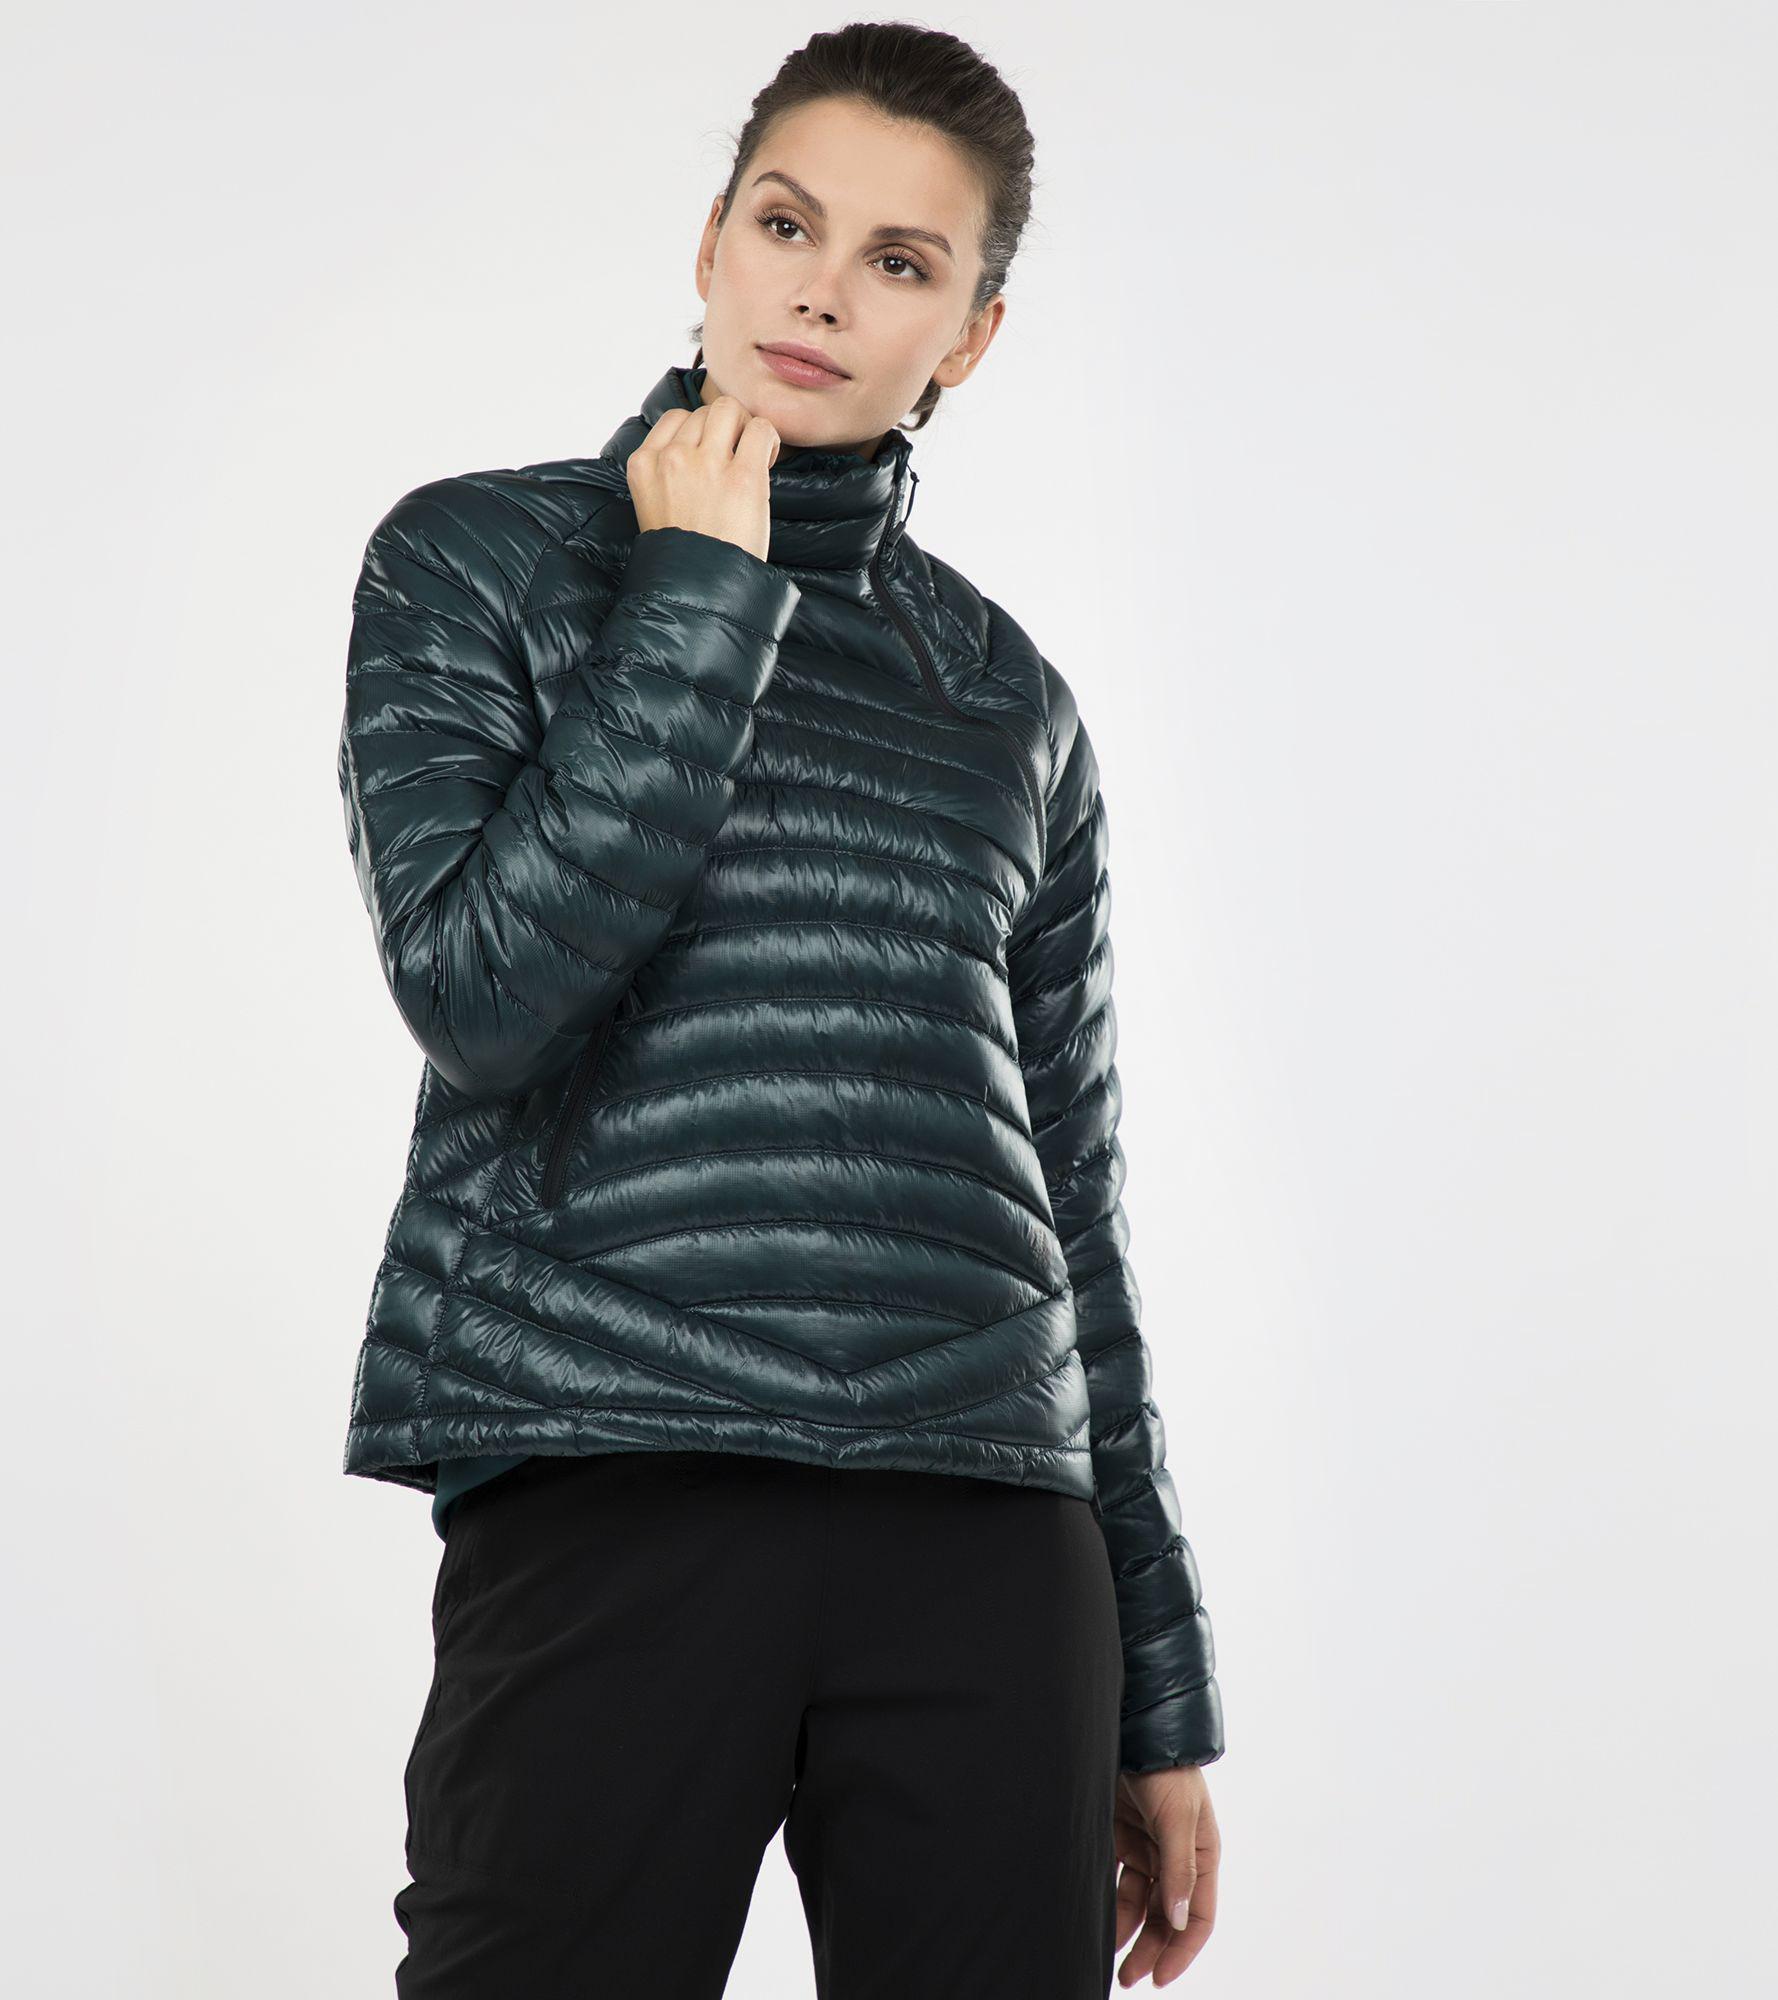 Mountain Hardwear Куртка пуховая женская Mountain Hardwear Ghost Whisperer™, размер 50 the elephant whisperer